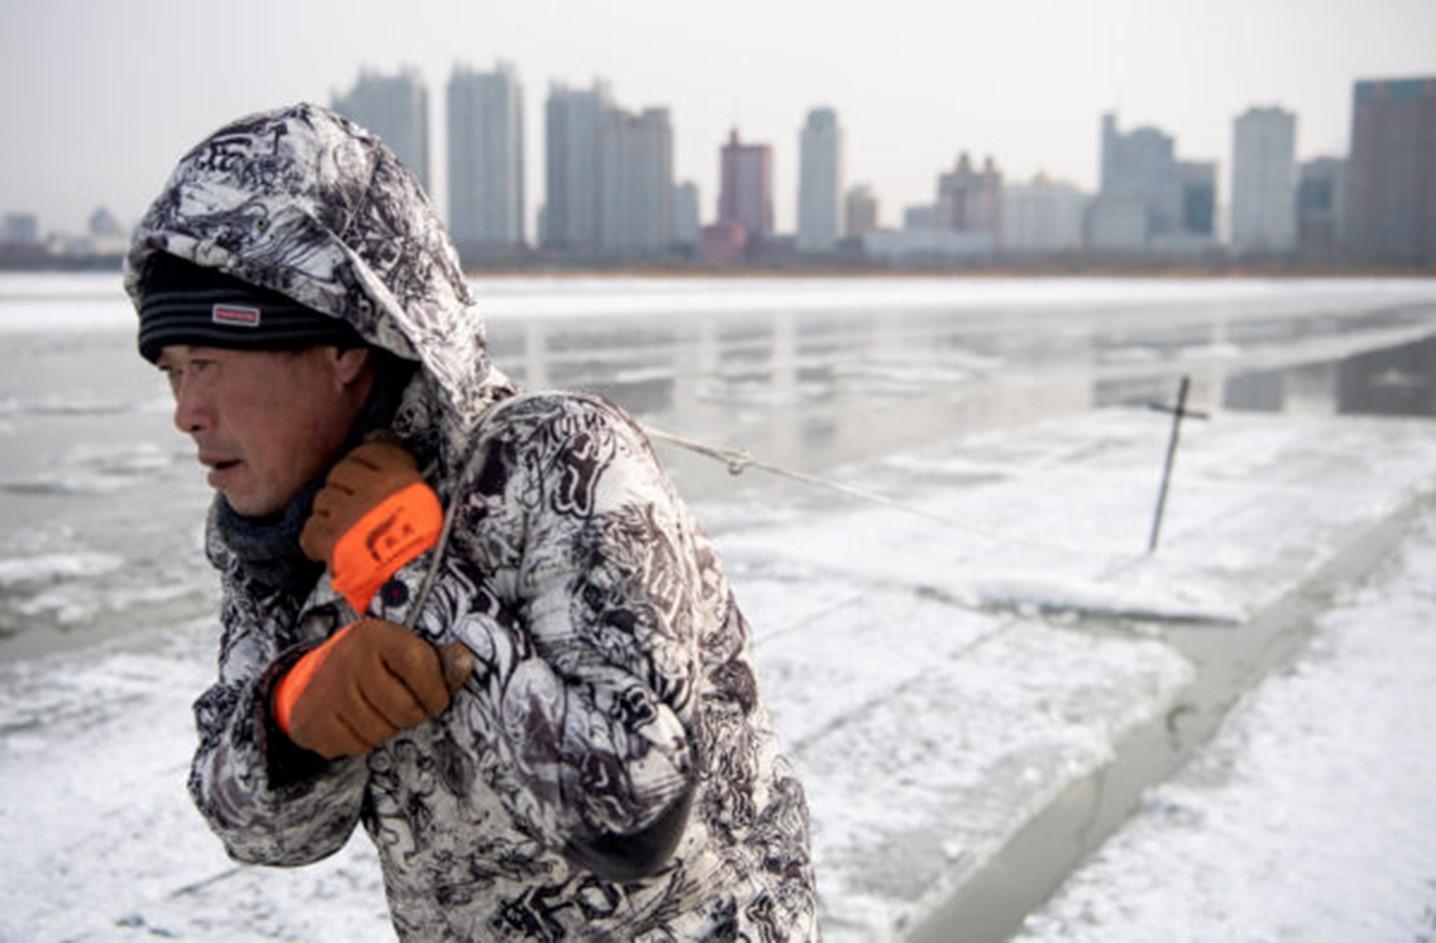 A worker dragging ice blocks on the Songhua river in Harbin, Heilongjiang